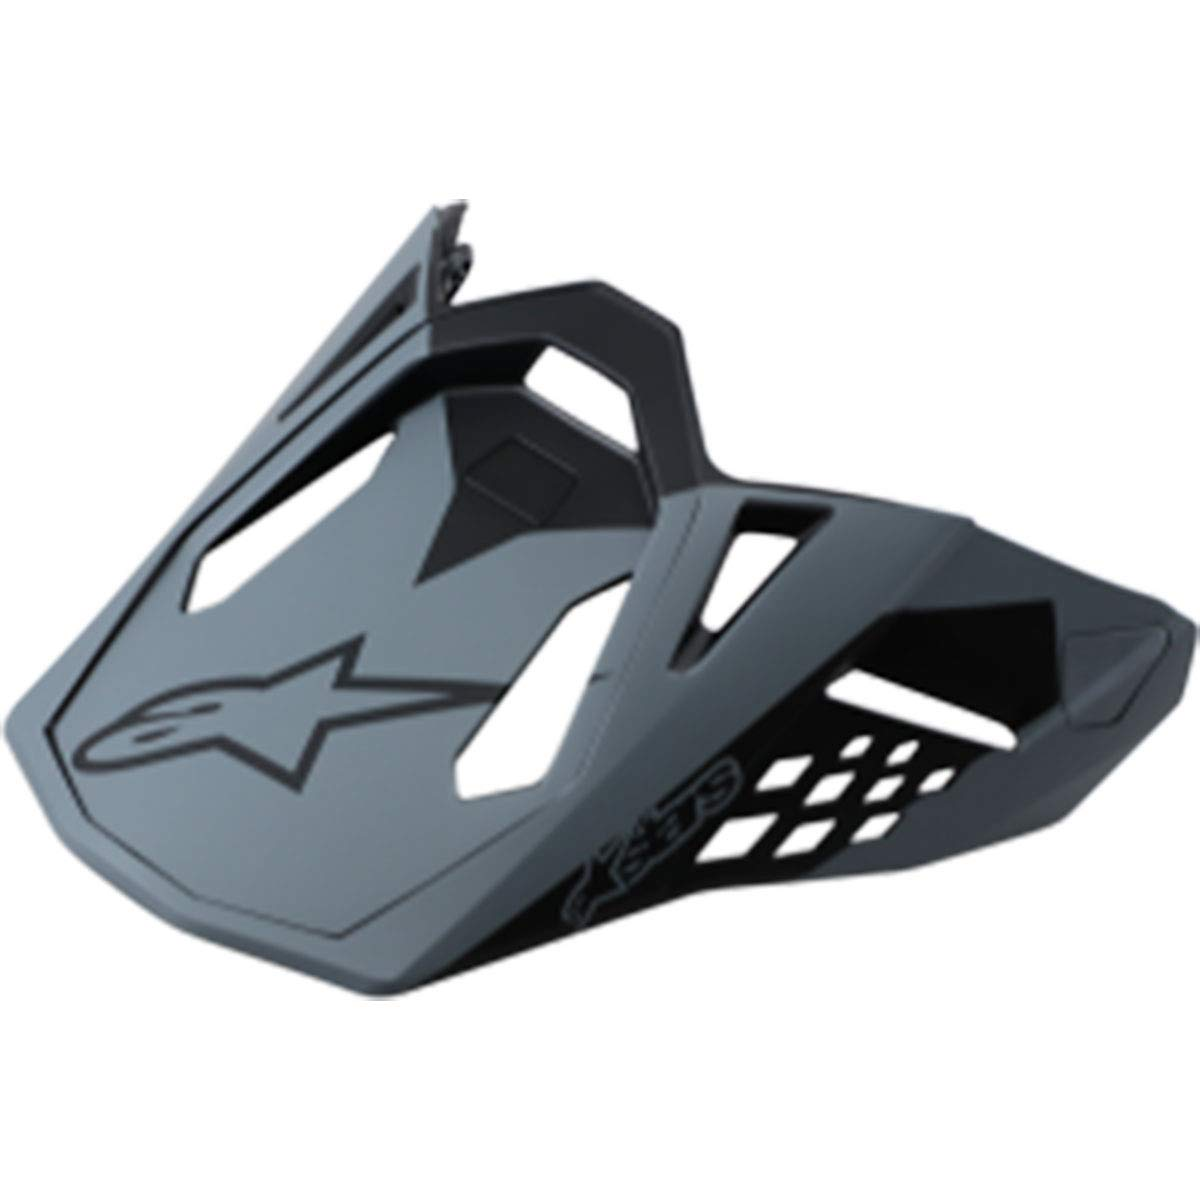 Alpinestars Supertech M10 Visor Off-Road Motorcycle Helmet Accessories - Matte Black/One Size